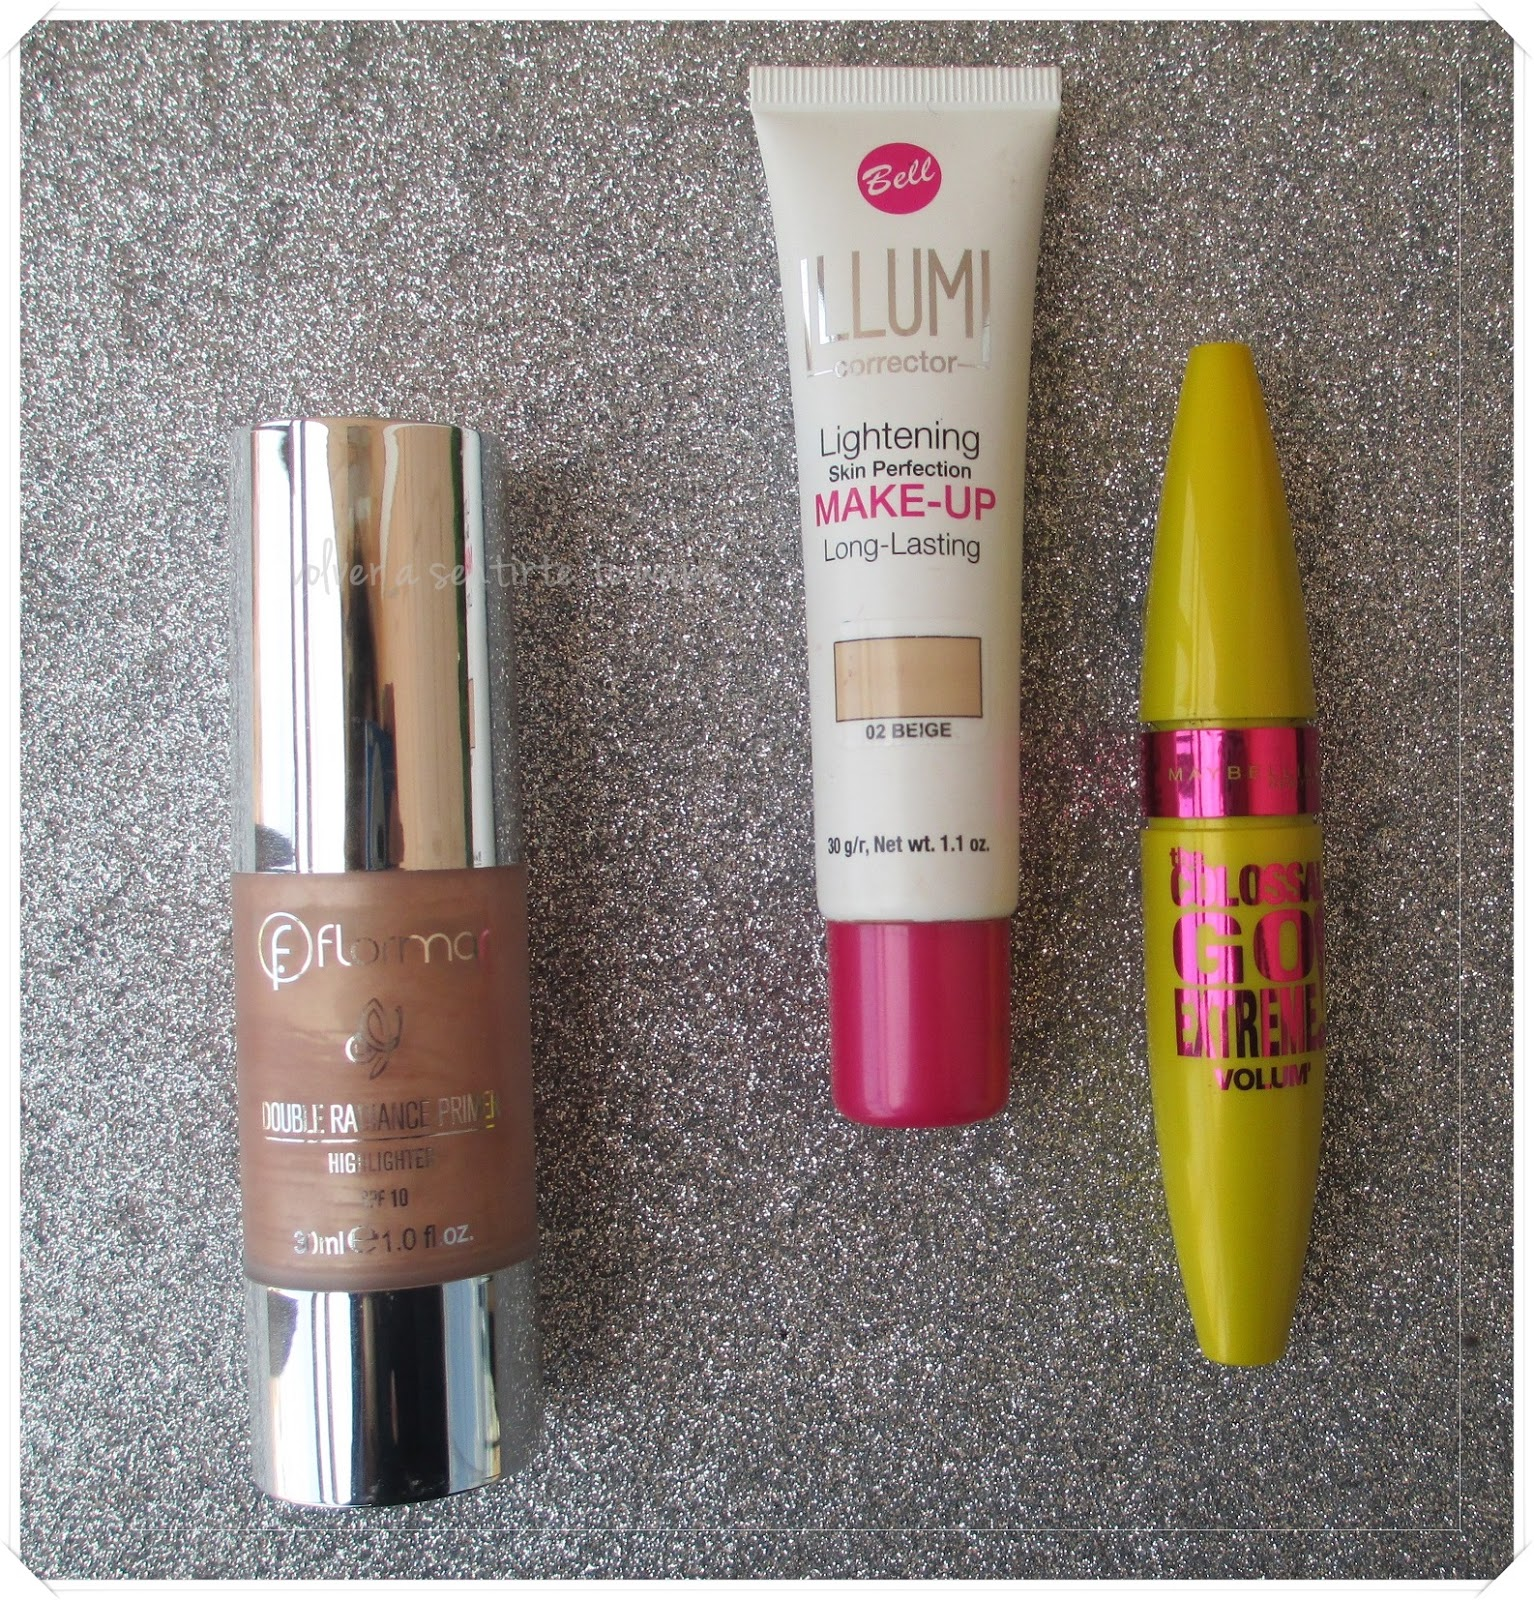 Favoritos de Maquillaje del 2014 - Volver a Sentirte to Wapa